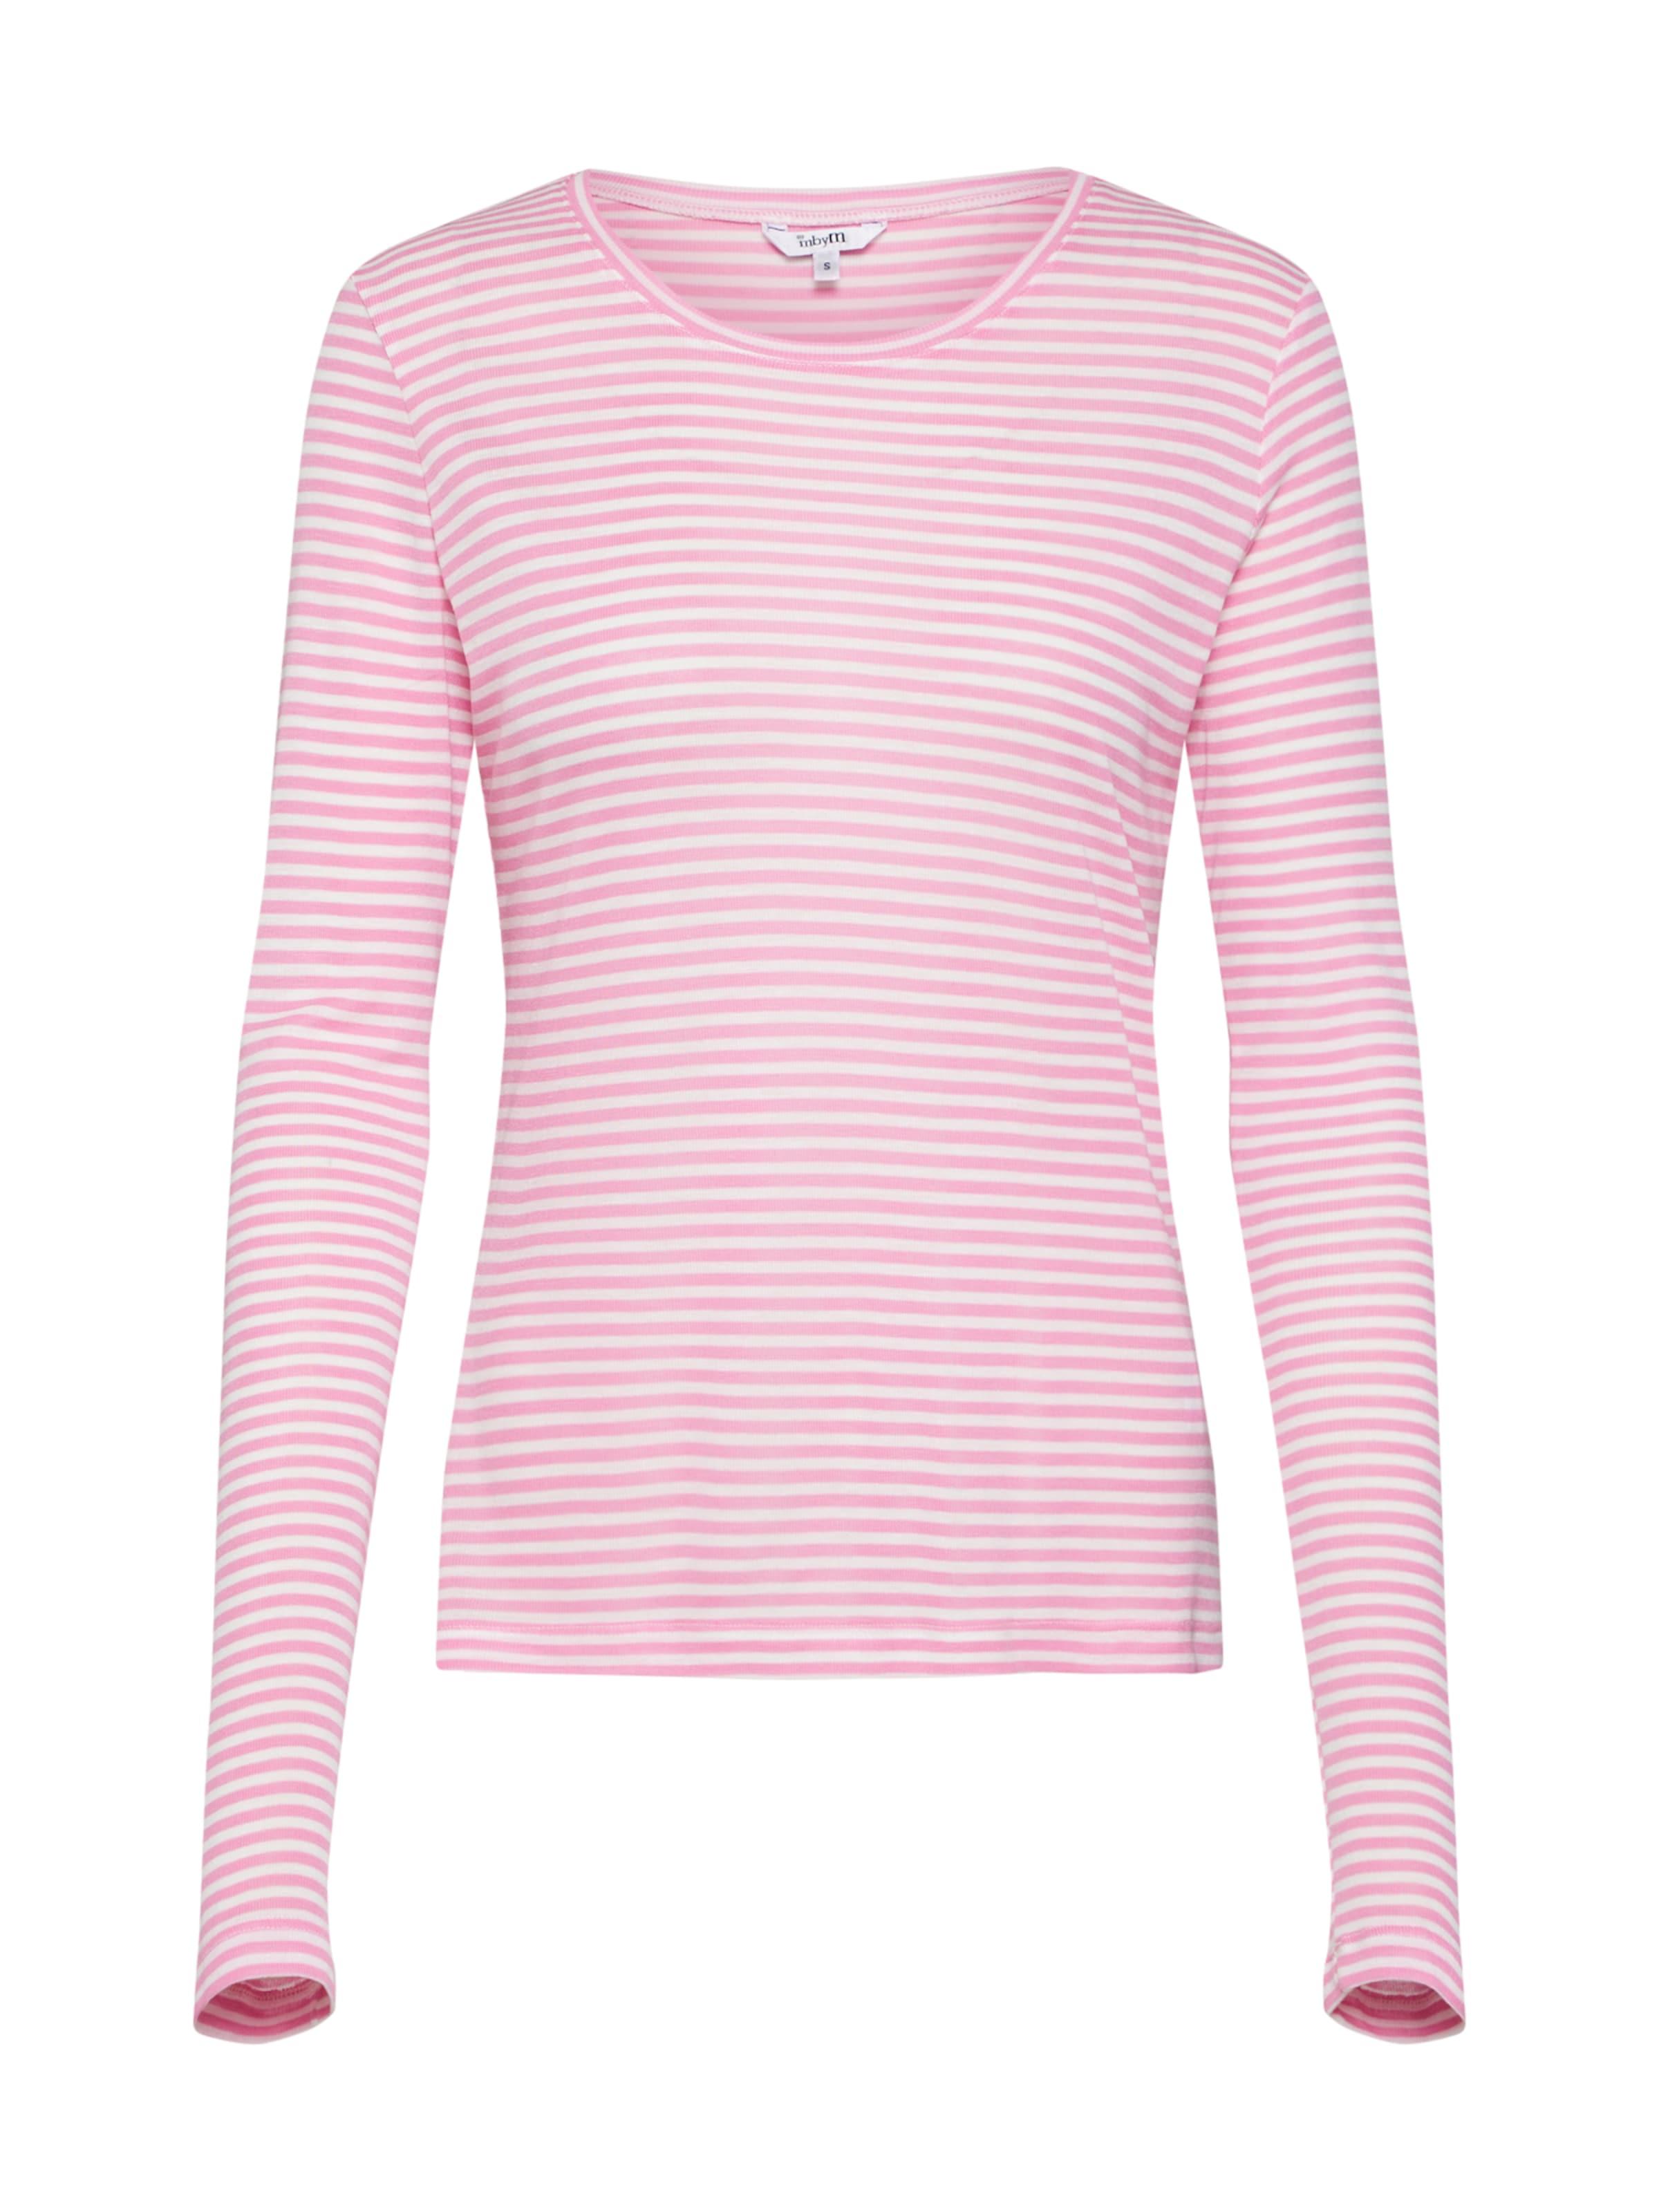 'lilita' CrèmeNoir Mbym En shirt T n0OkwP